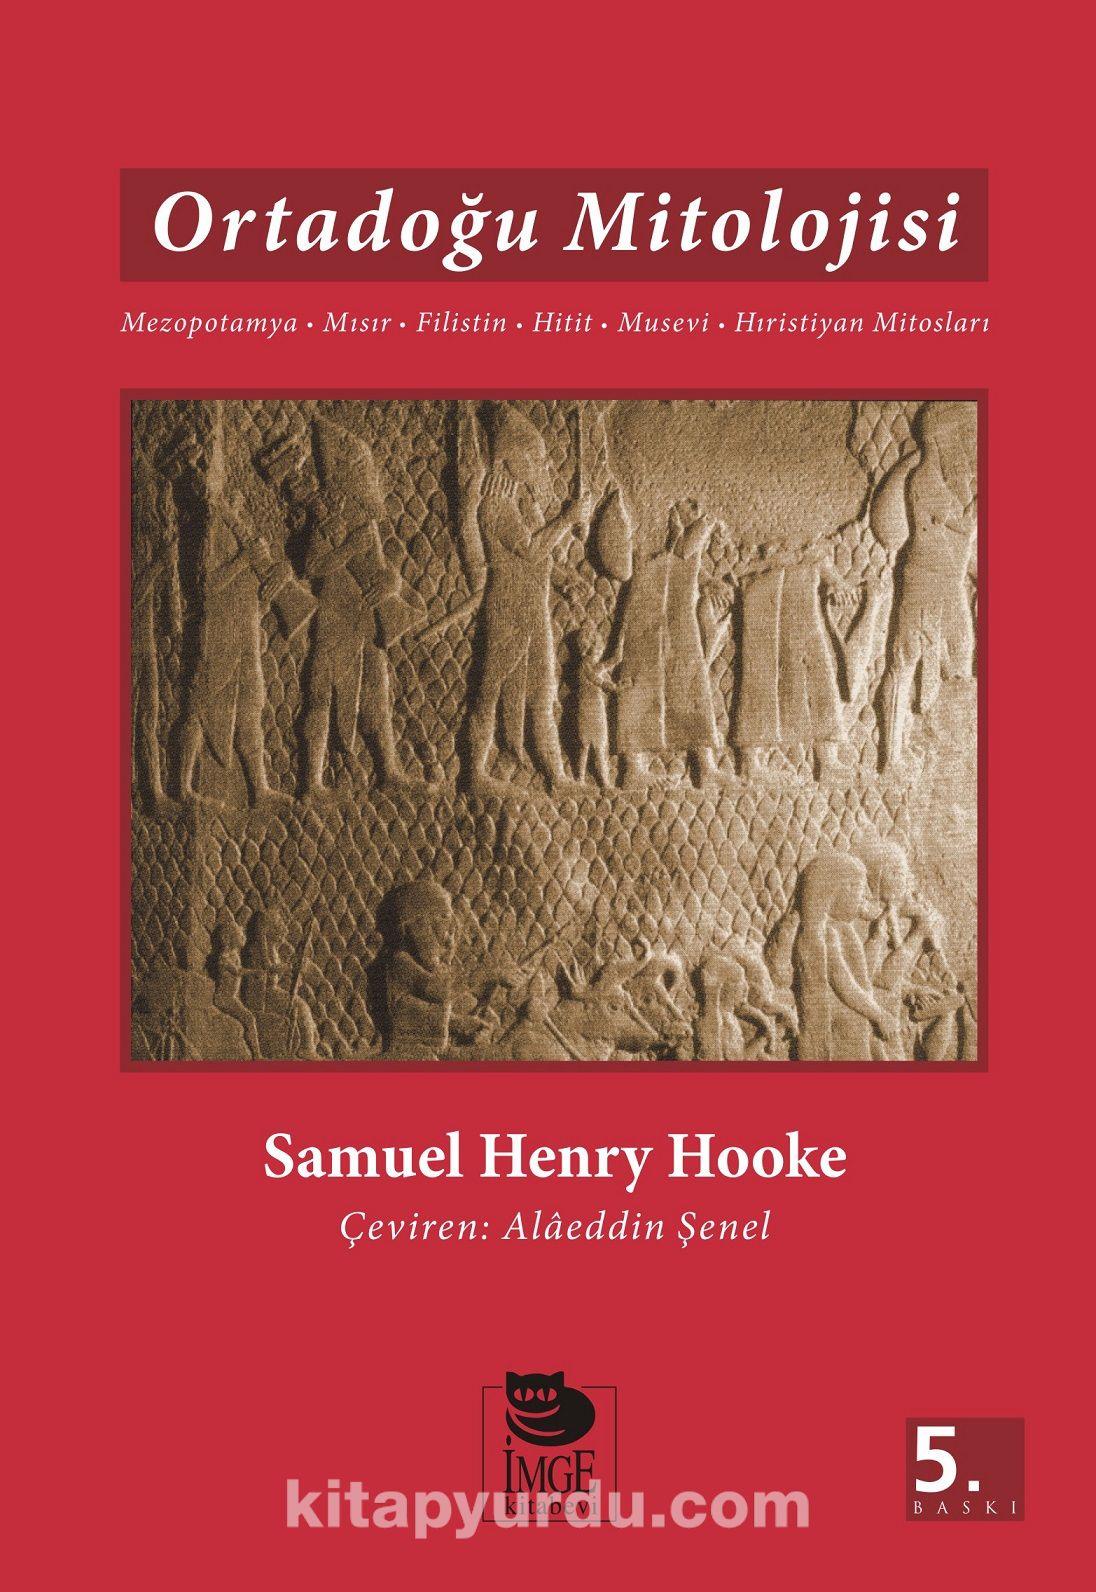 Ortadoğu Mitolojisi - Samuel Henry Hooke pdf epub